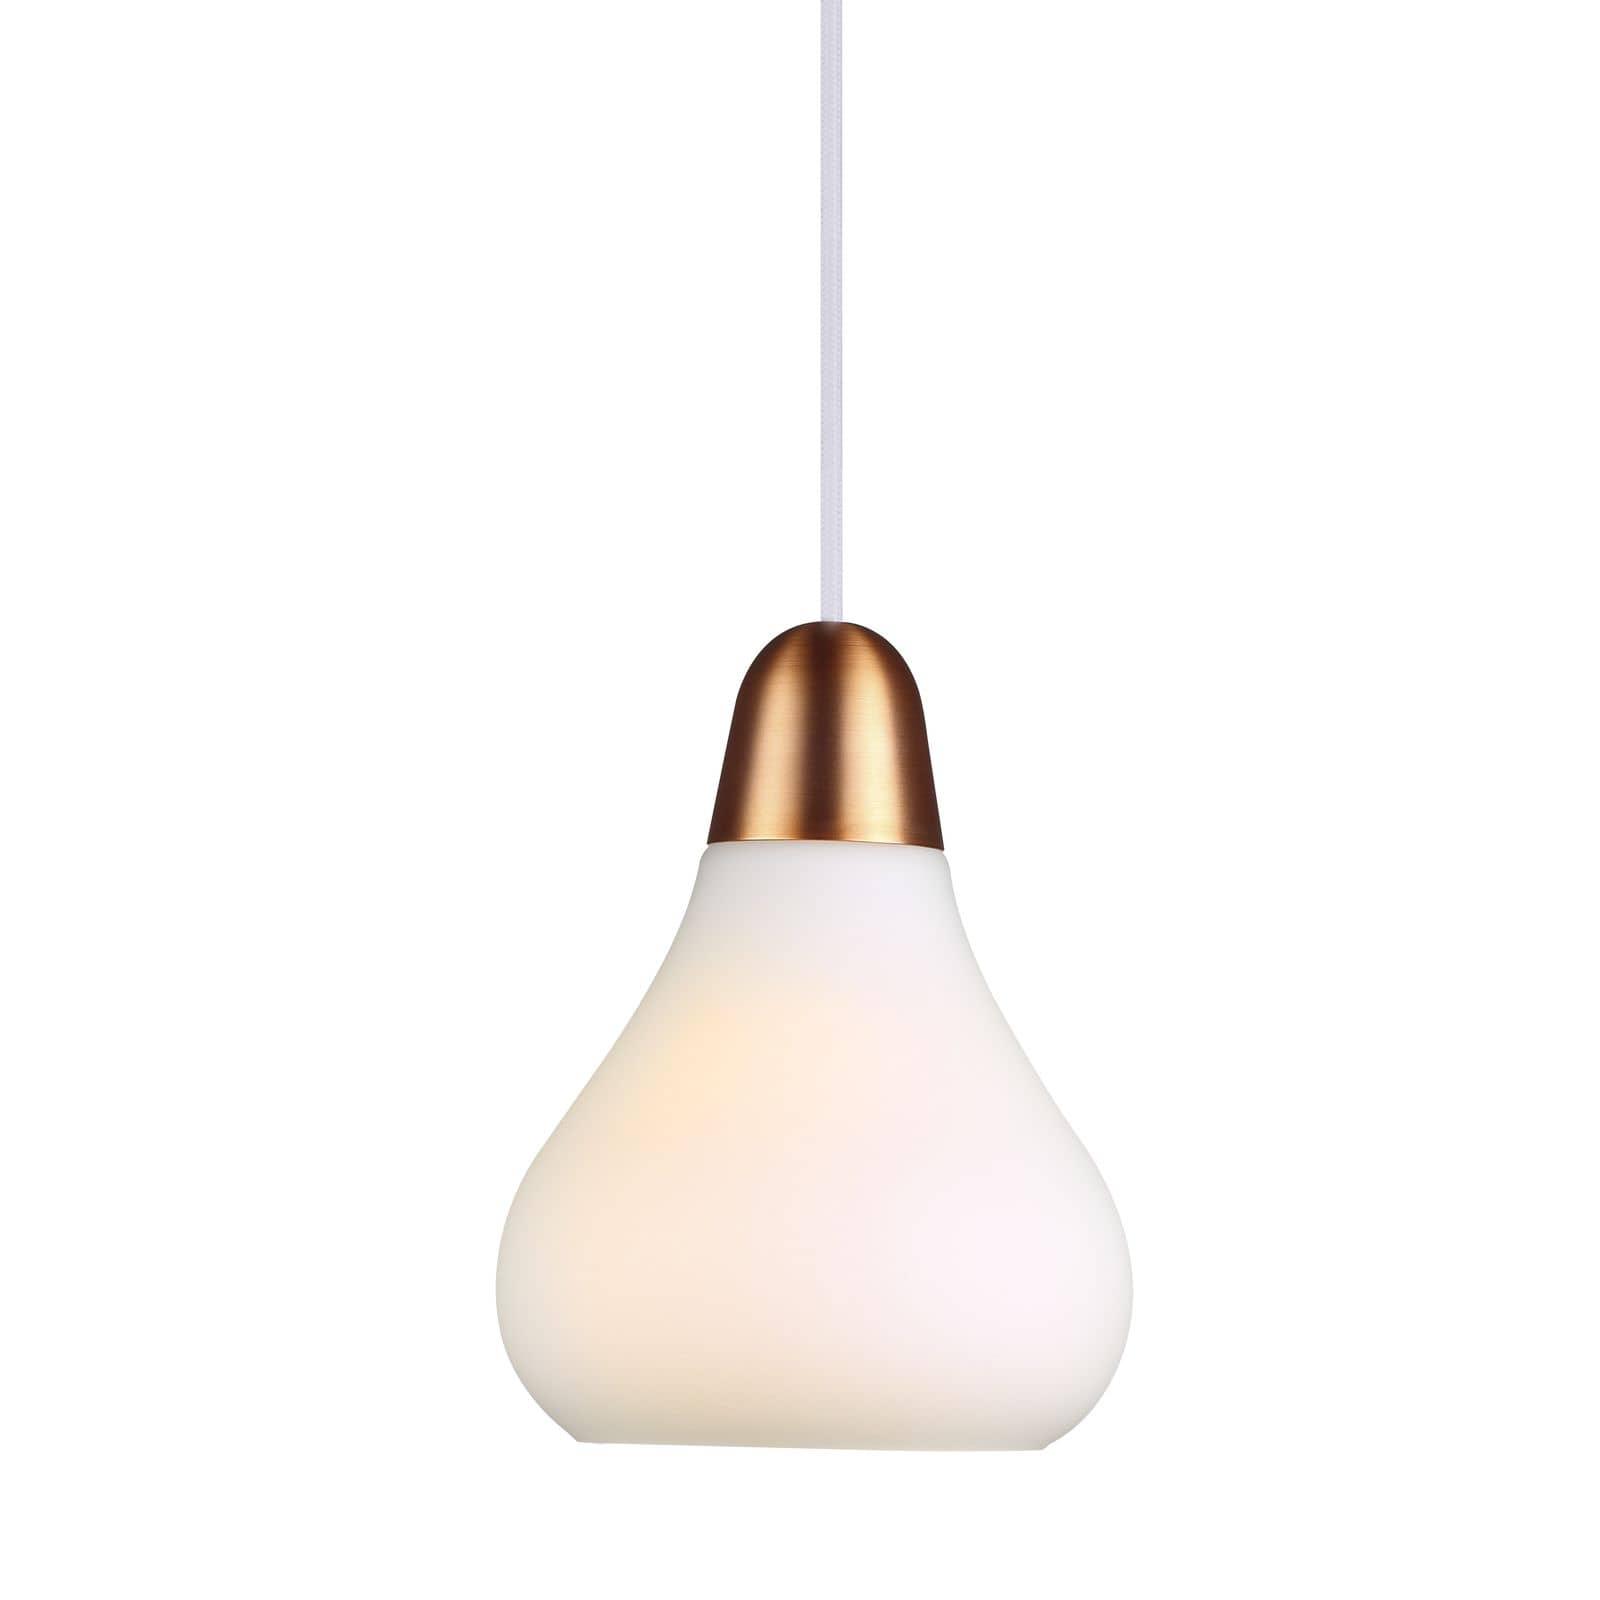 Nordlux 78163030 bloom16 pendelleuchte e27 glas metall kupfer for Nordlux leuchten